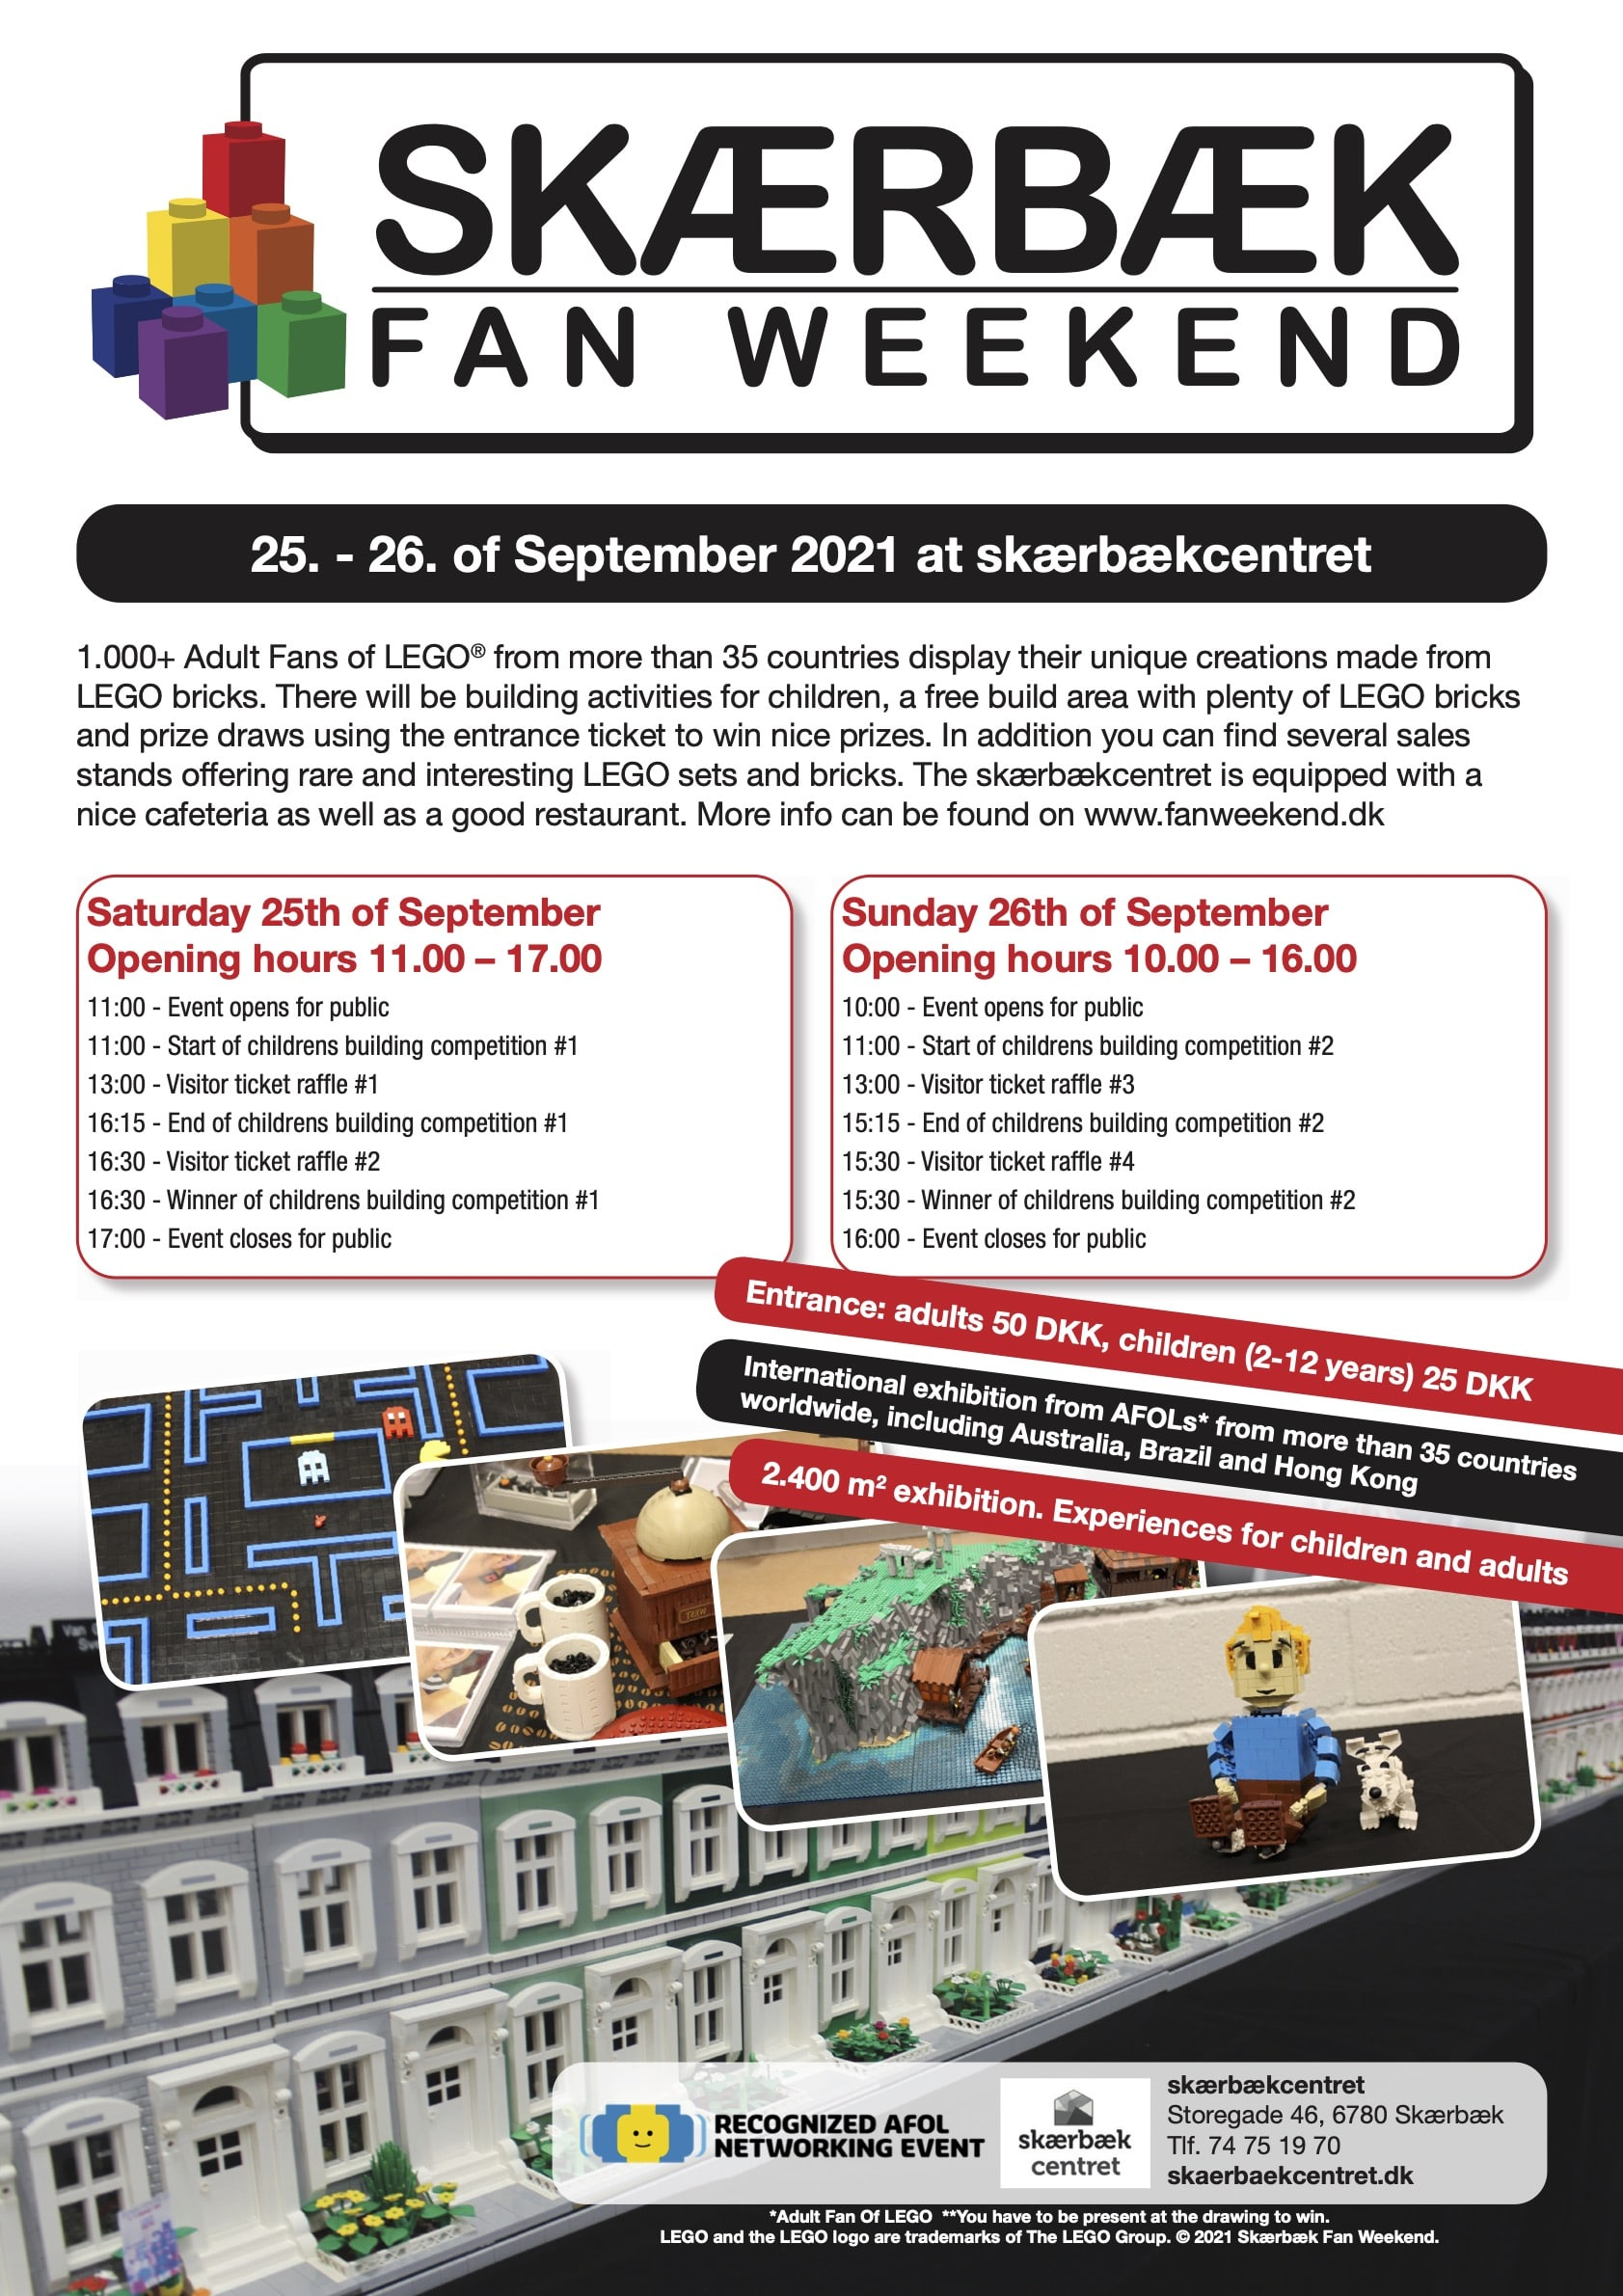 Skaerbaek Fan Weekend Poster Flyer 2021